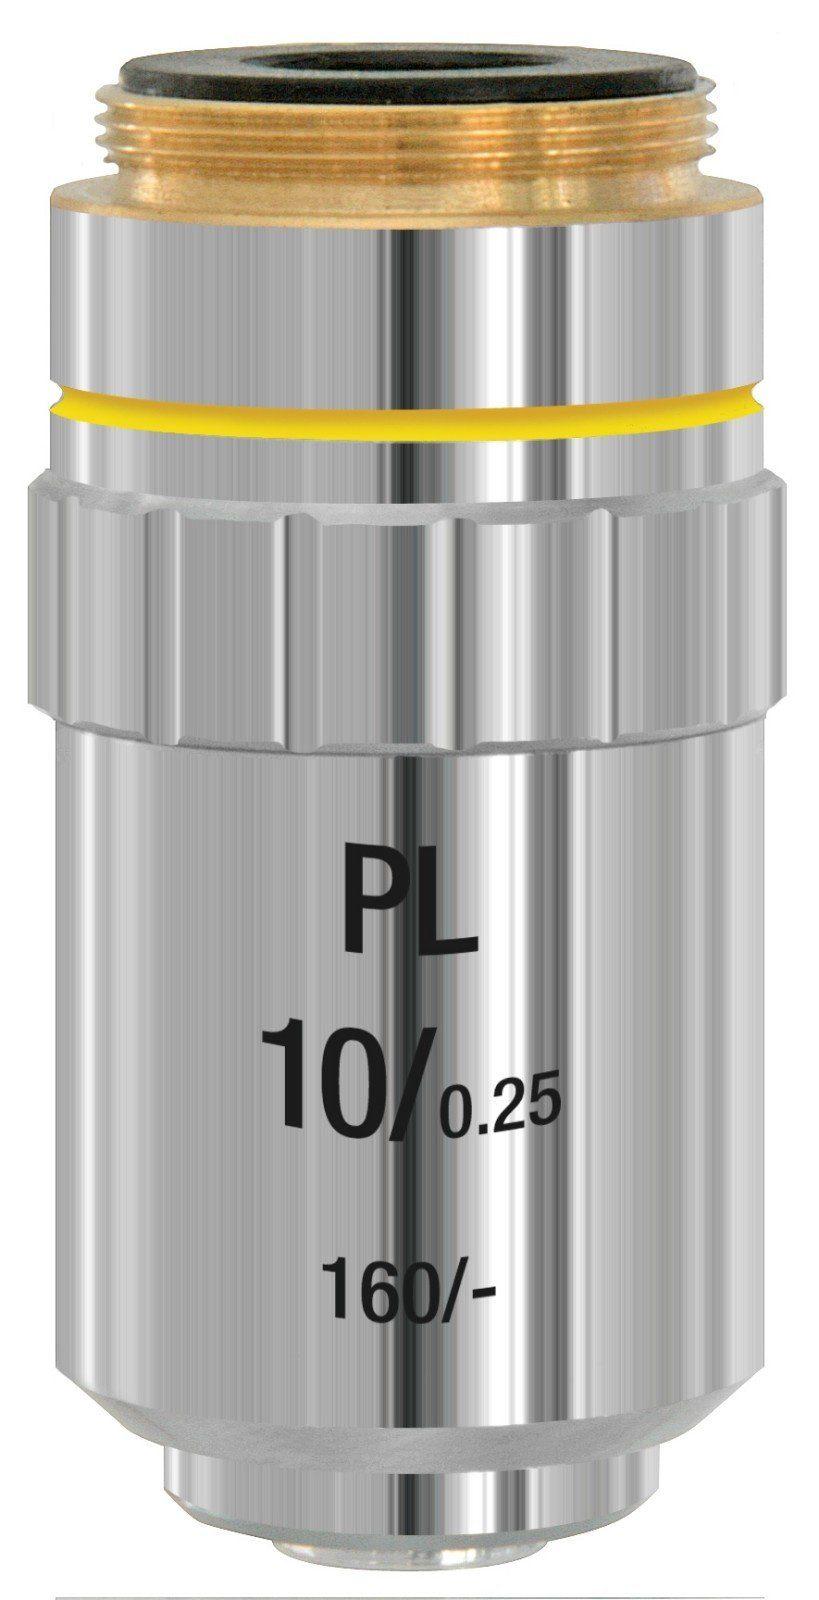 BRESSER Mikroskop »BRESSER Planachromat Objektiv 10x«